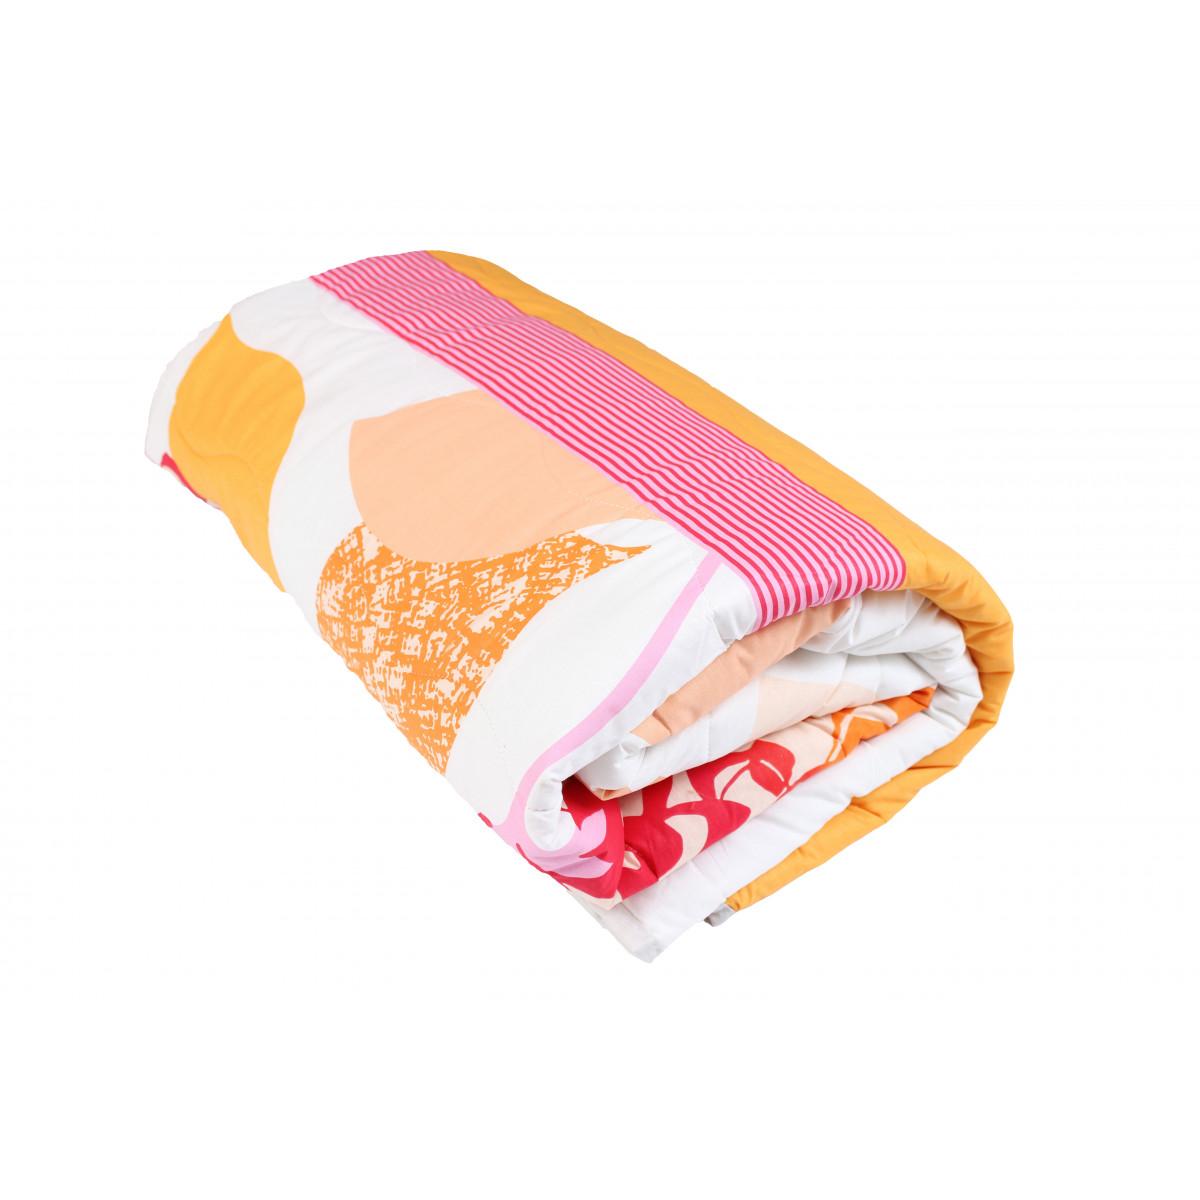 Пролетна завивка - 100% памук ранфорс - 200/210 - 150гр/м2 - Лаура